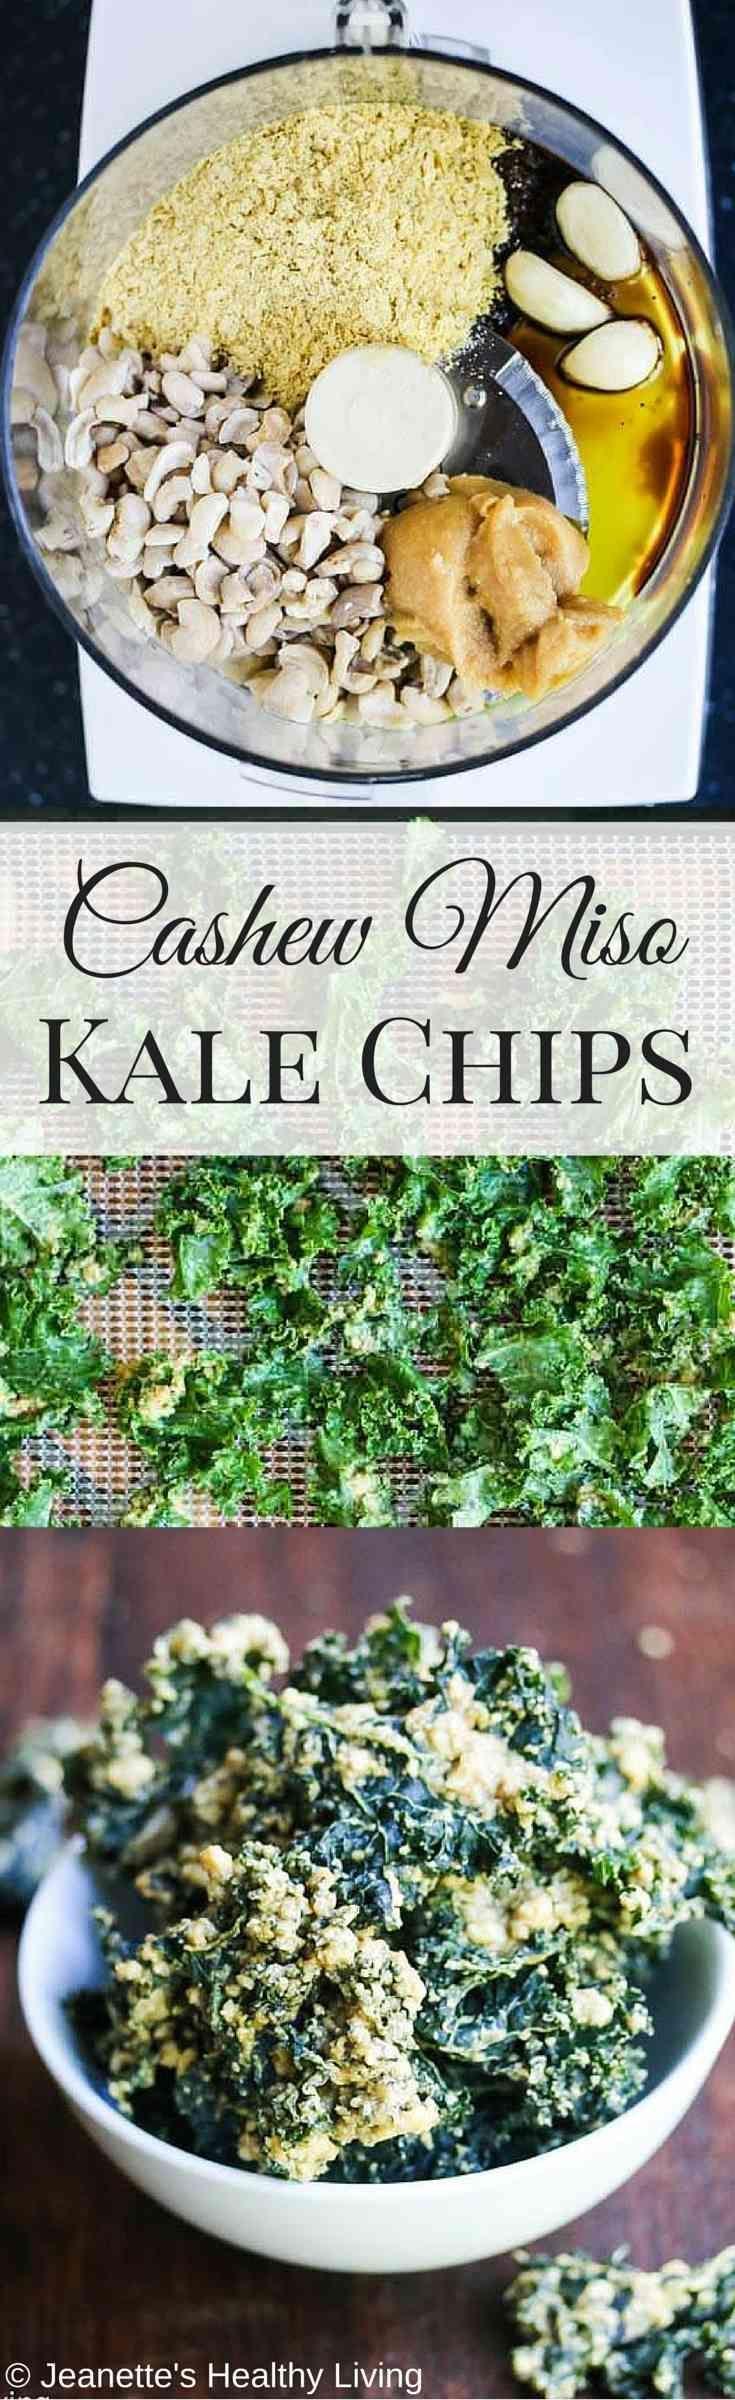 ... Kale on Pinterest | Kale caesar salad, Kale chip recipes and Kale